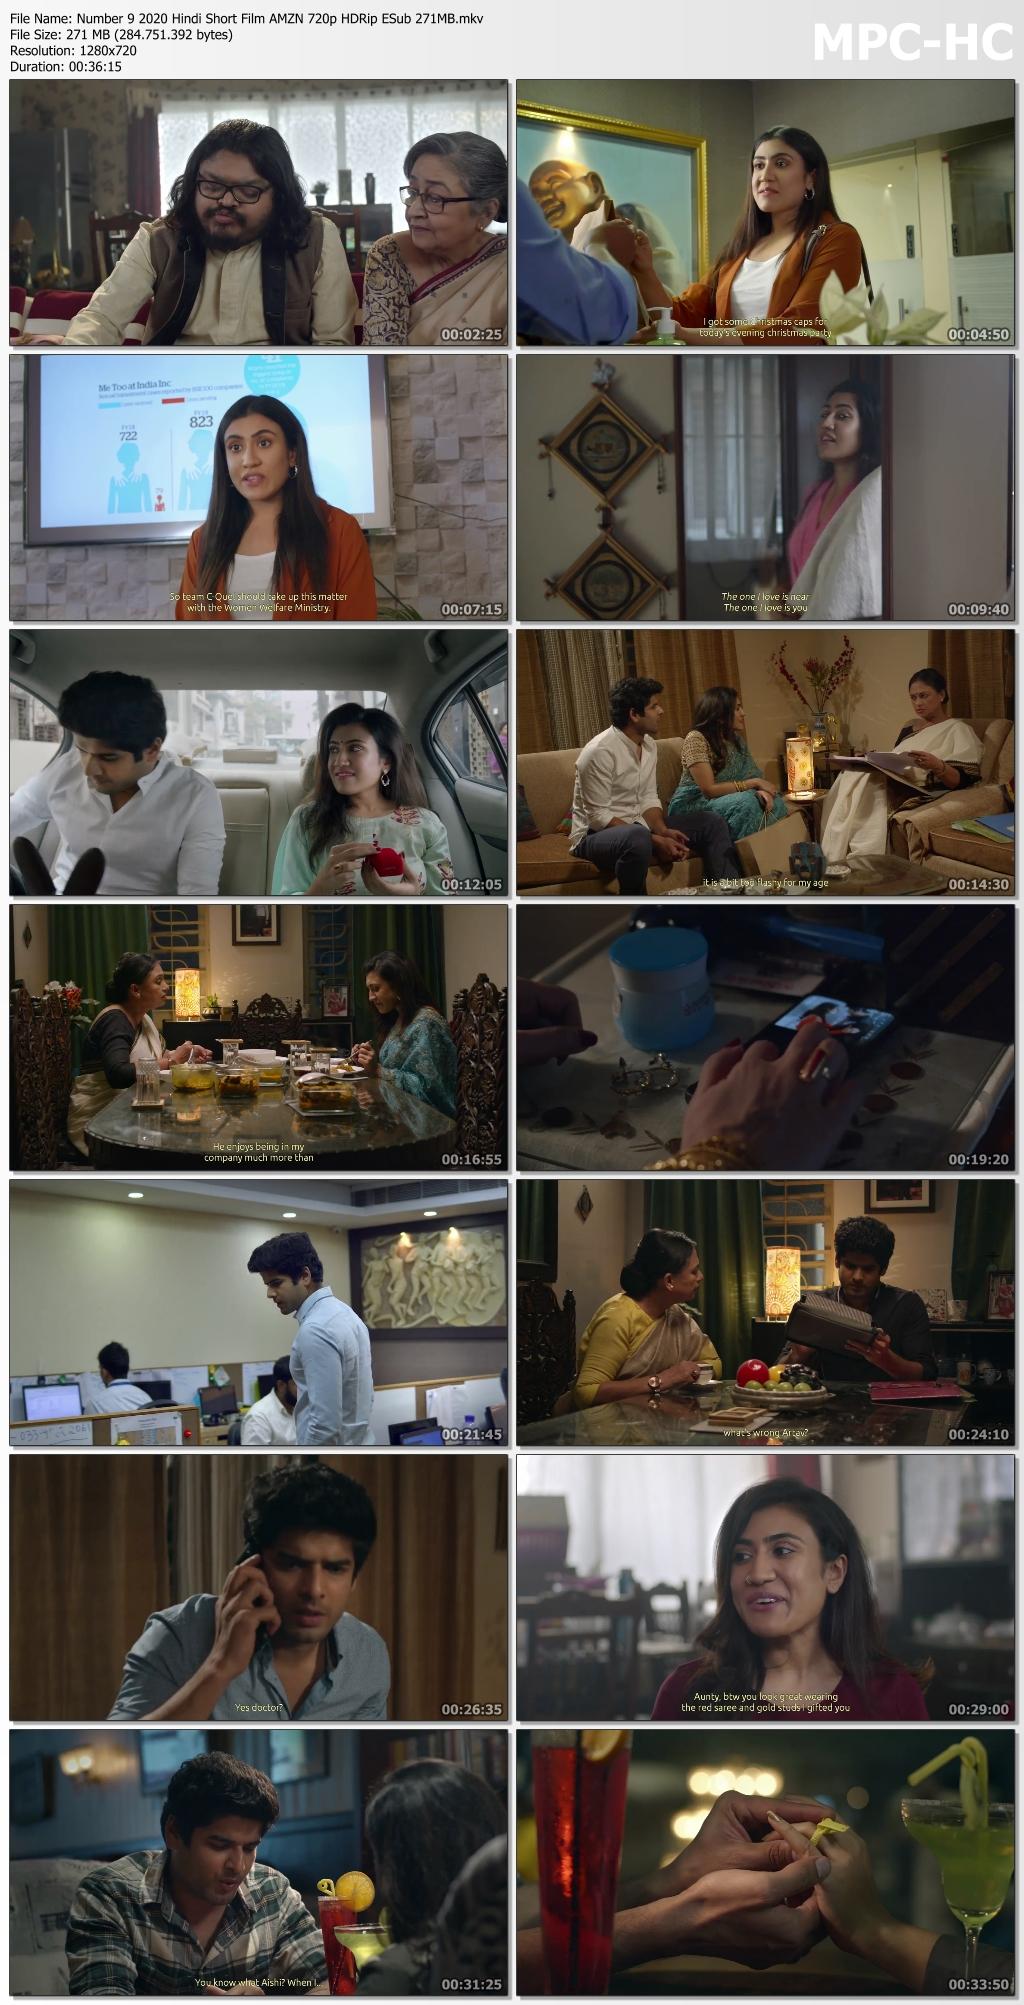 Number-9-2020-Hindi-Short-Film-AMZN-720p-HDRip-ESub-271-MB-mkv-thumbs